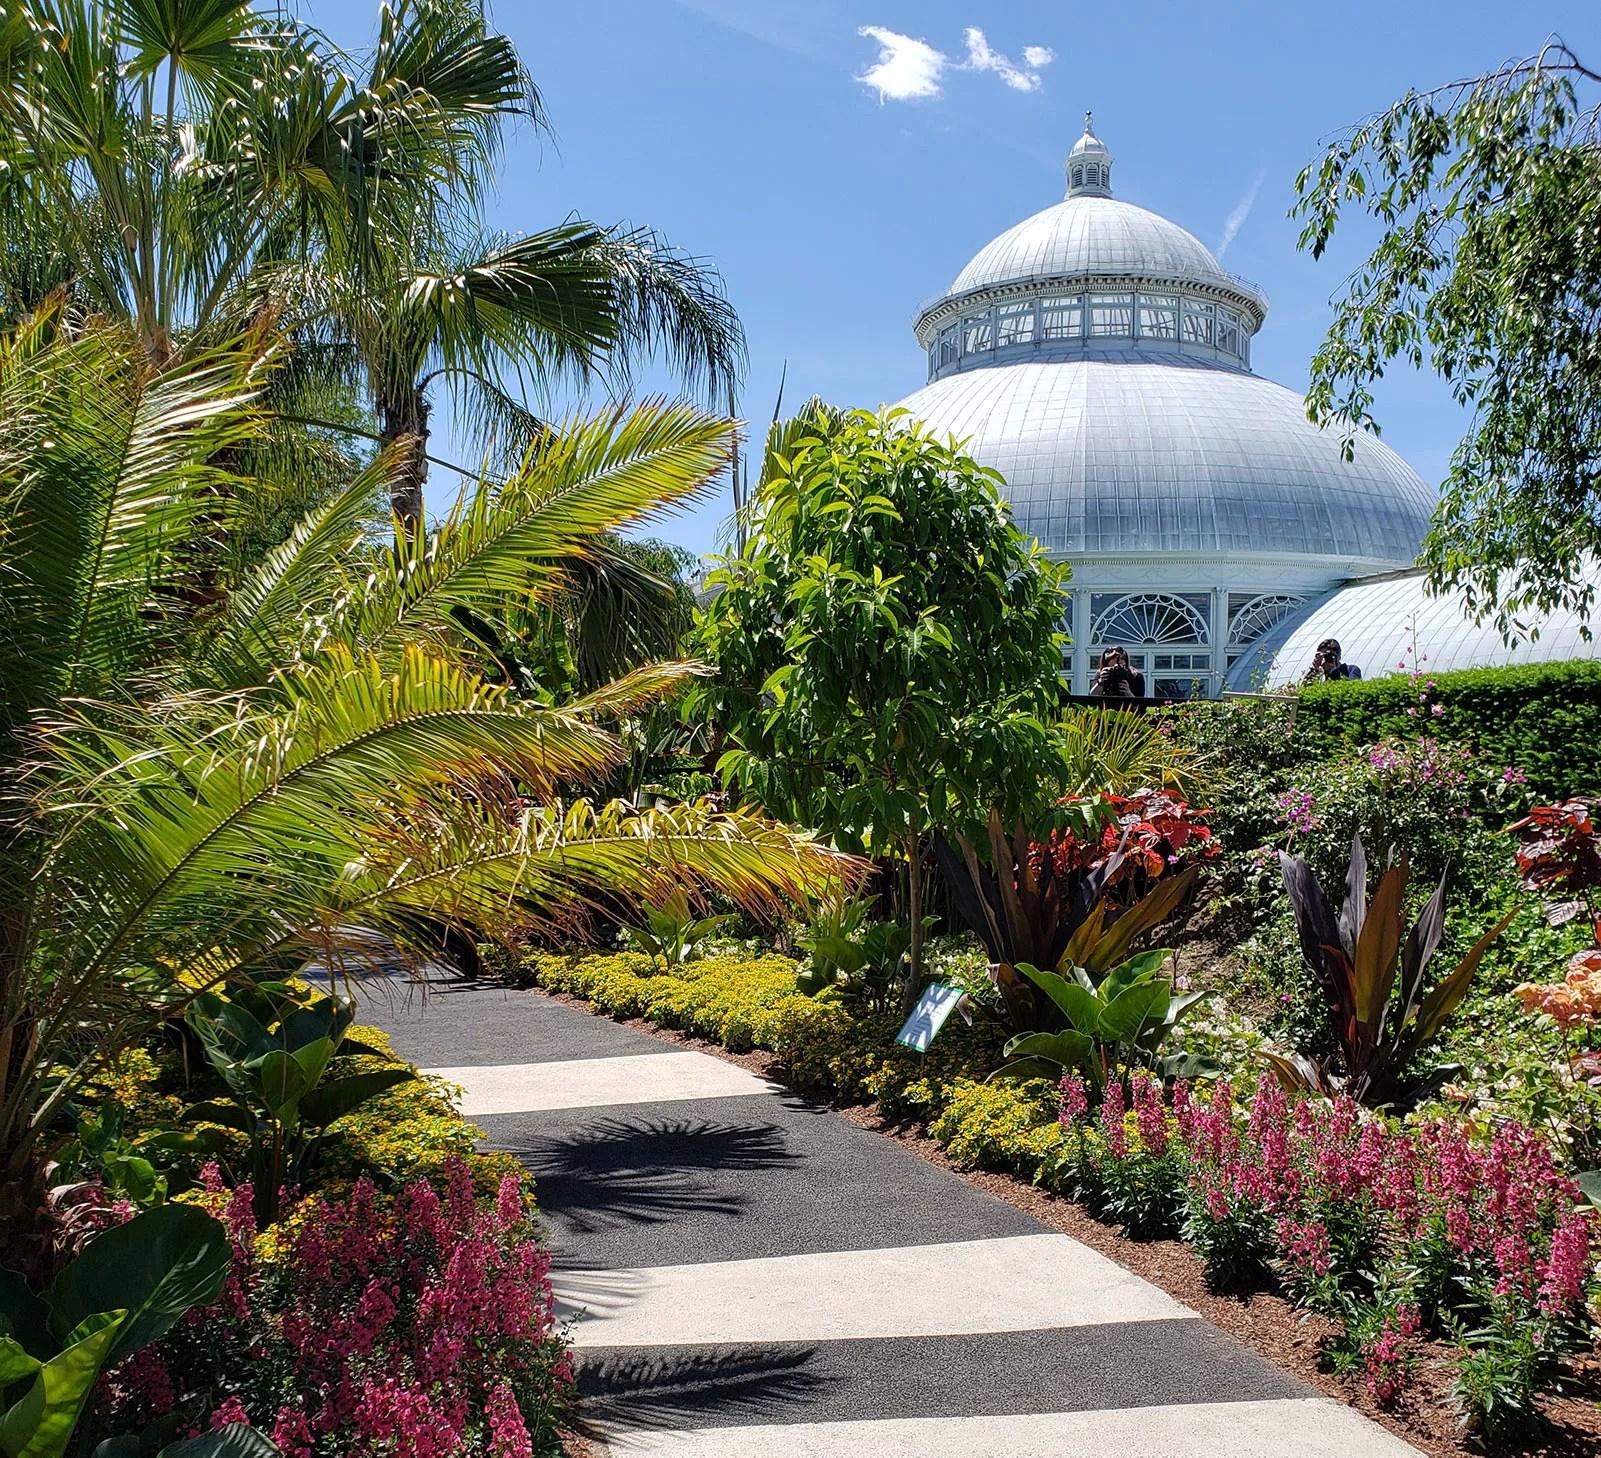 From brazil to the bronx the new york botanical garden 39 s - Restaurants near bronx botanical garden ...